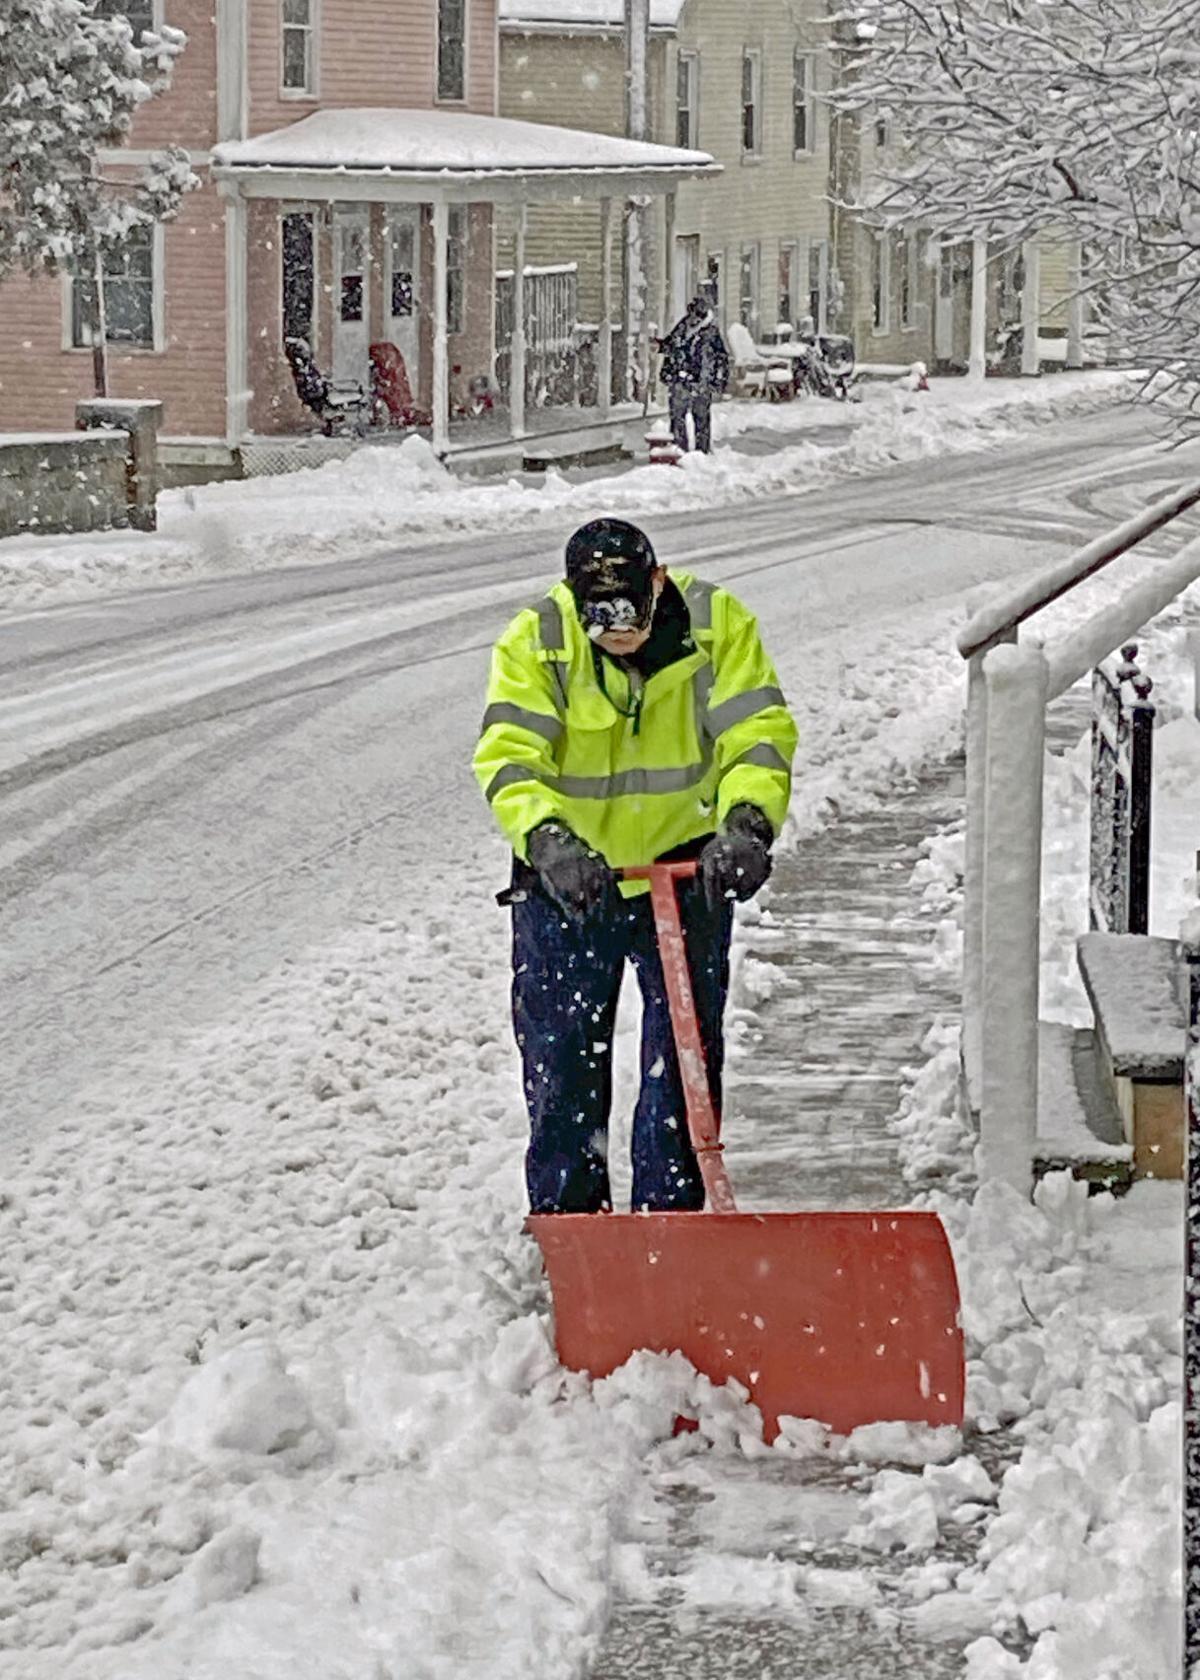 021021 North End shoveling hero 28480.JPG